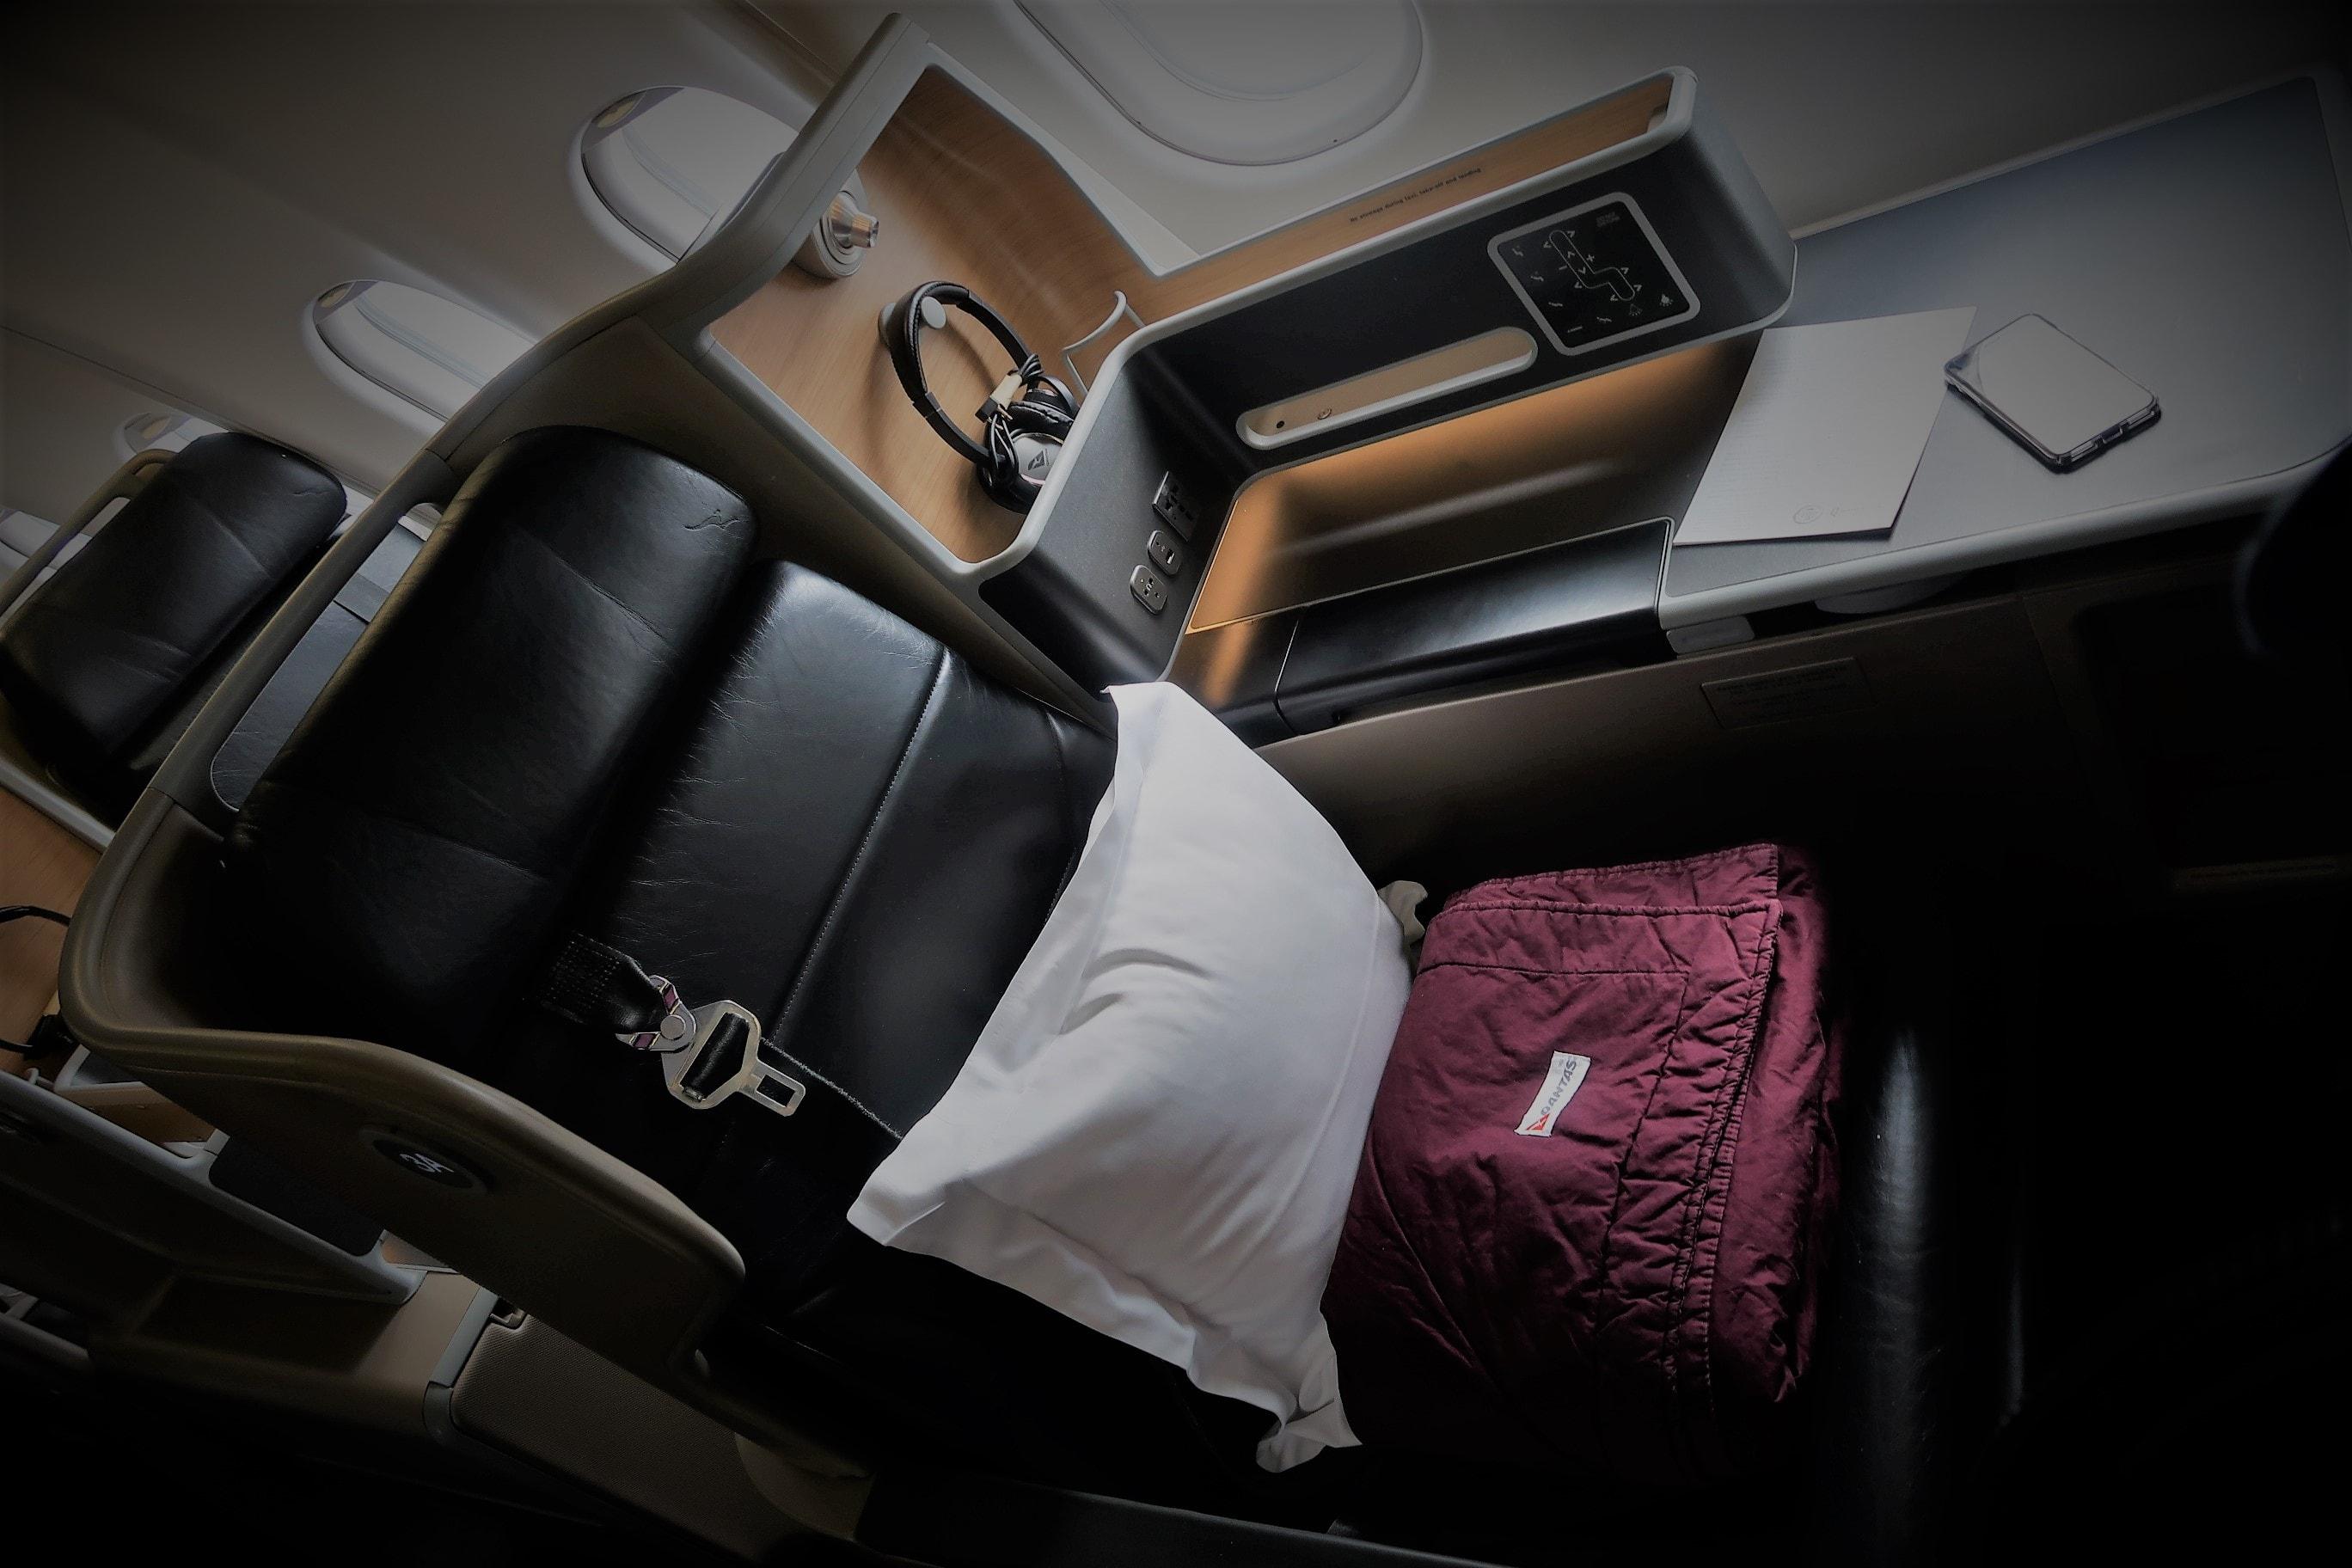 Westpac Altitude Platinum Visa: 60,000 bonus Qantas or Altitude Points ($0 first year annual fee)